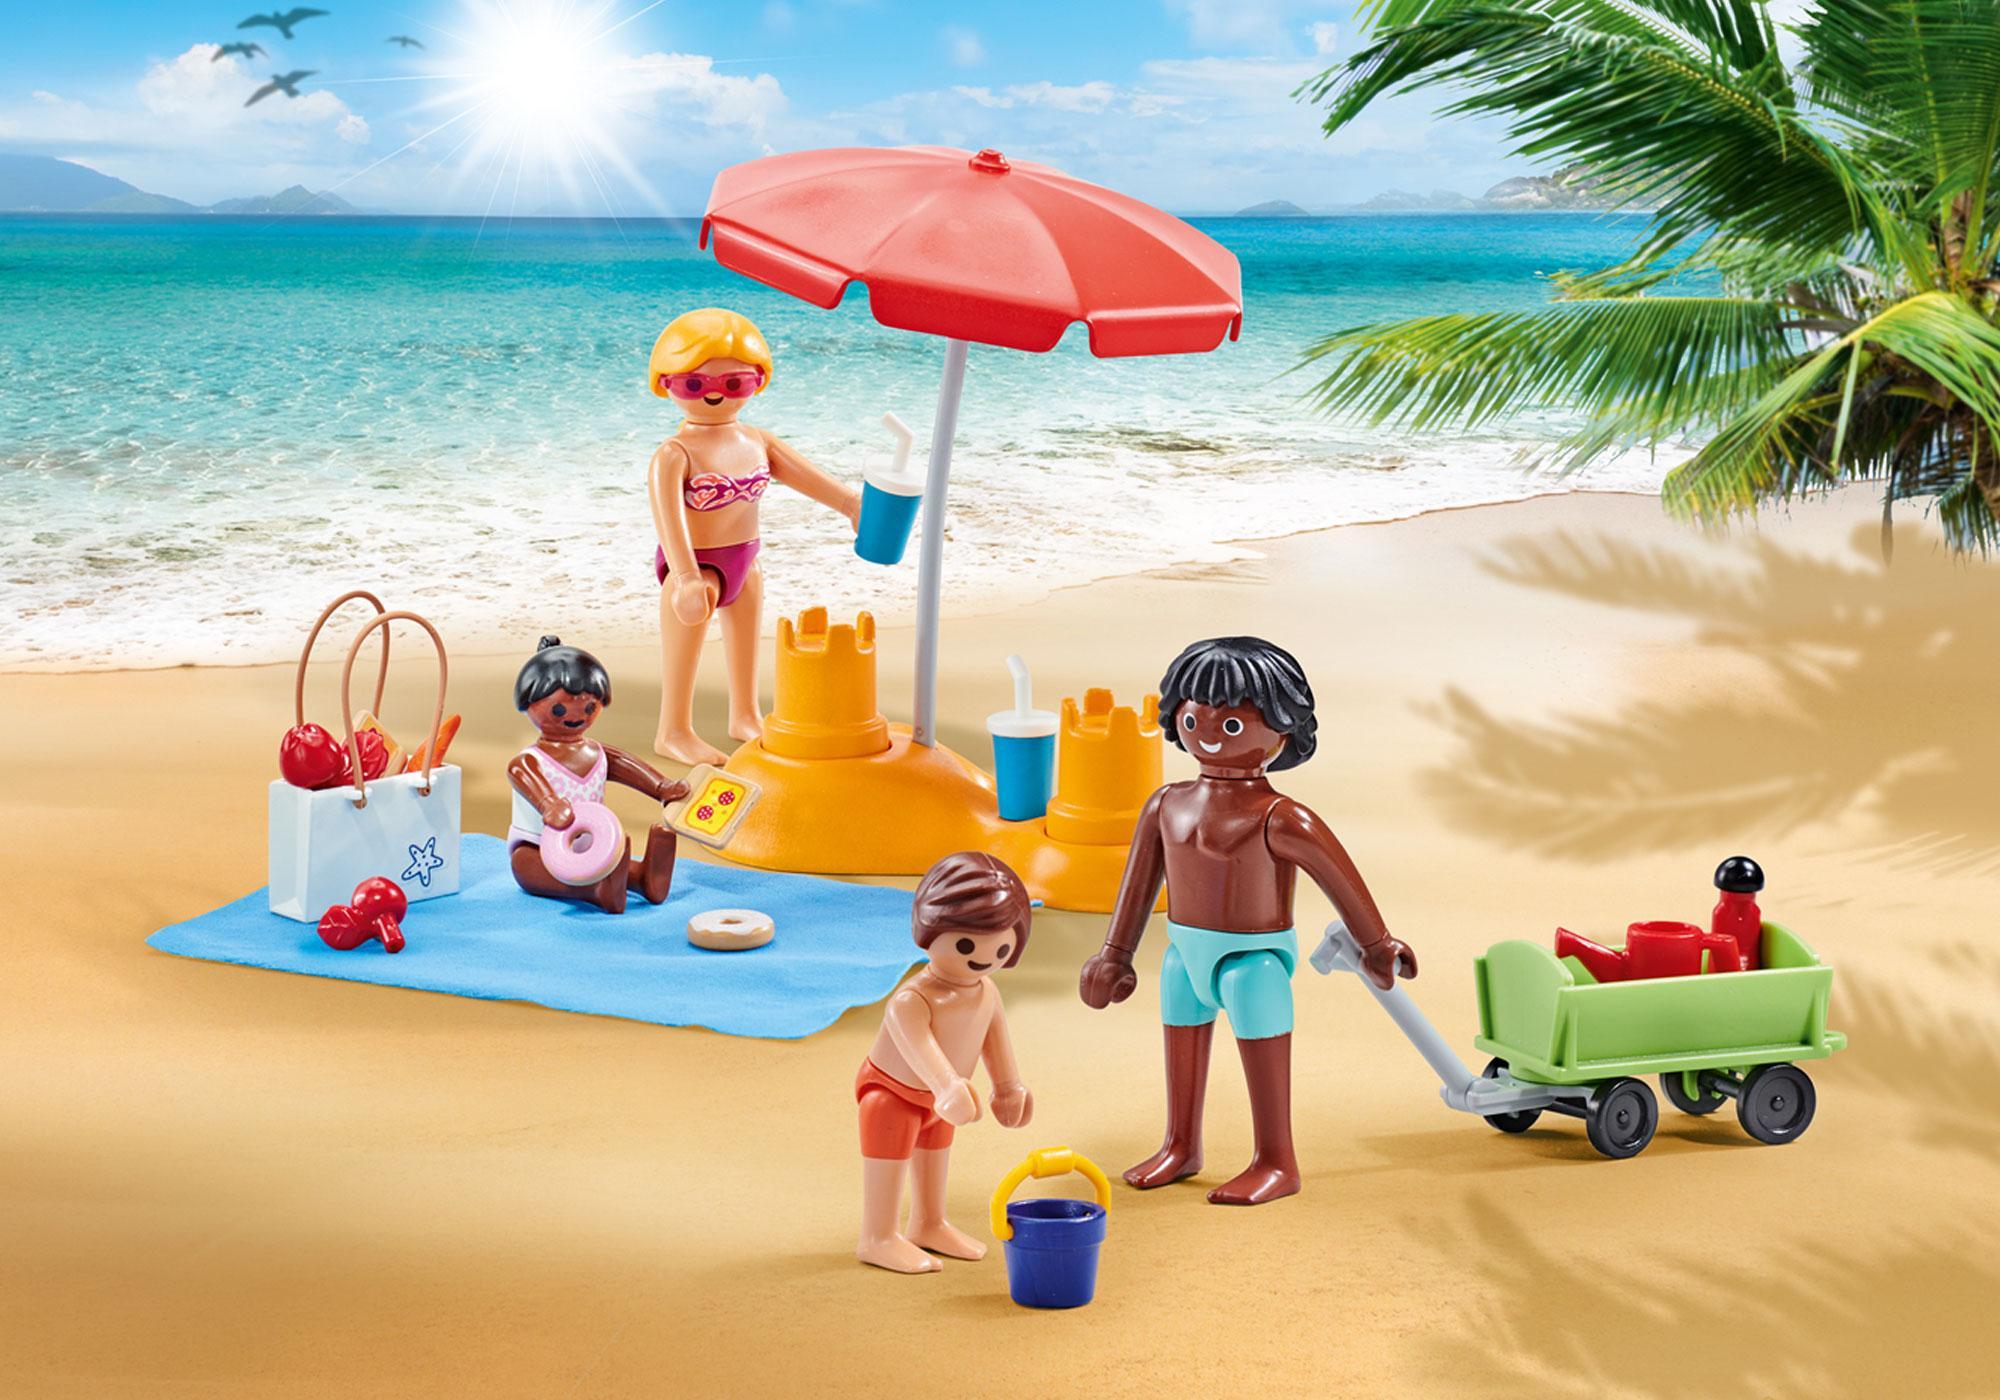 http://media.playmobil.com/i/playmobil/9819_product_detail/Οικογένεια στην παραλία